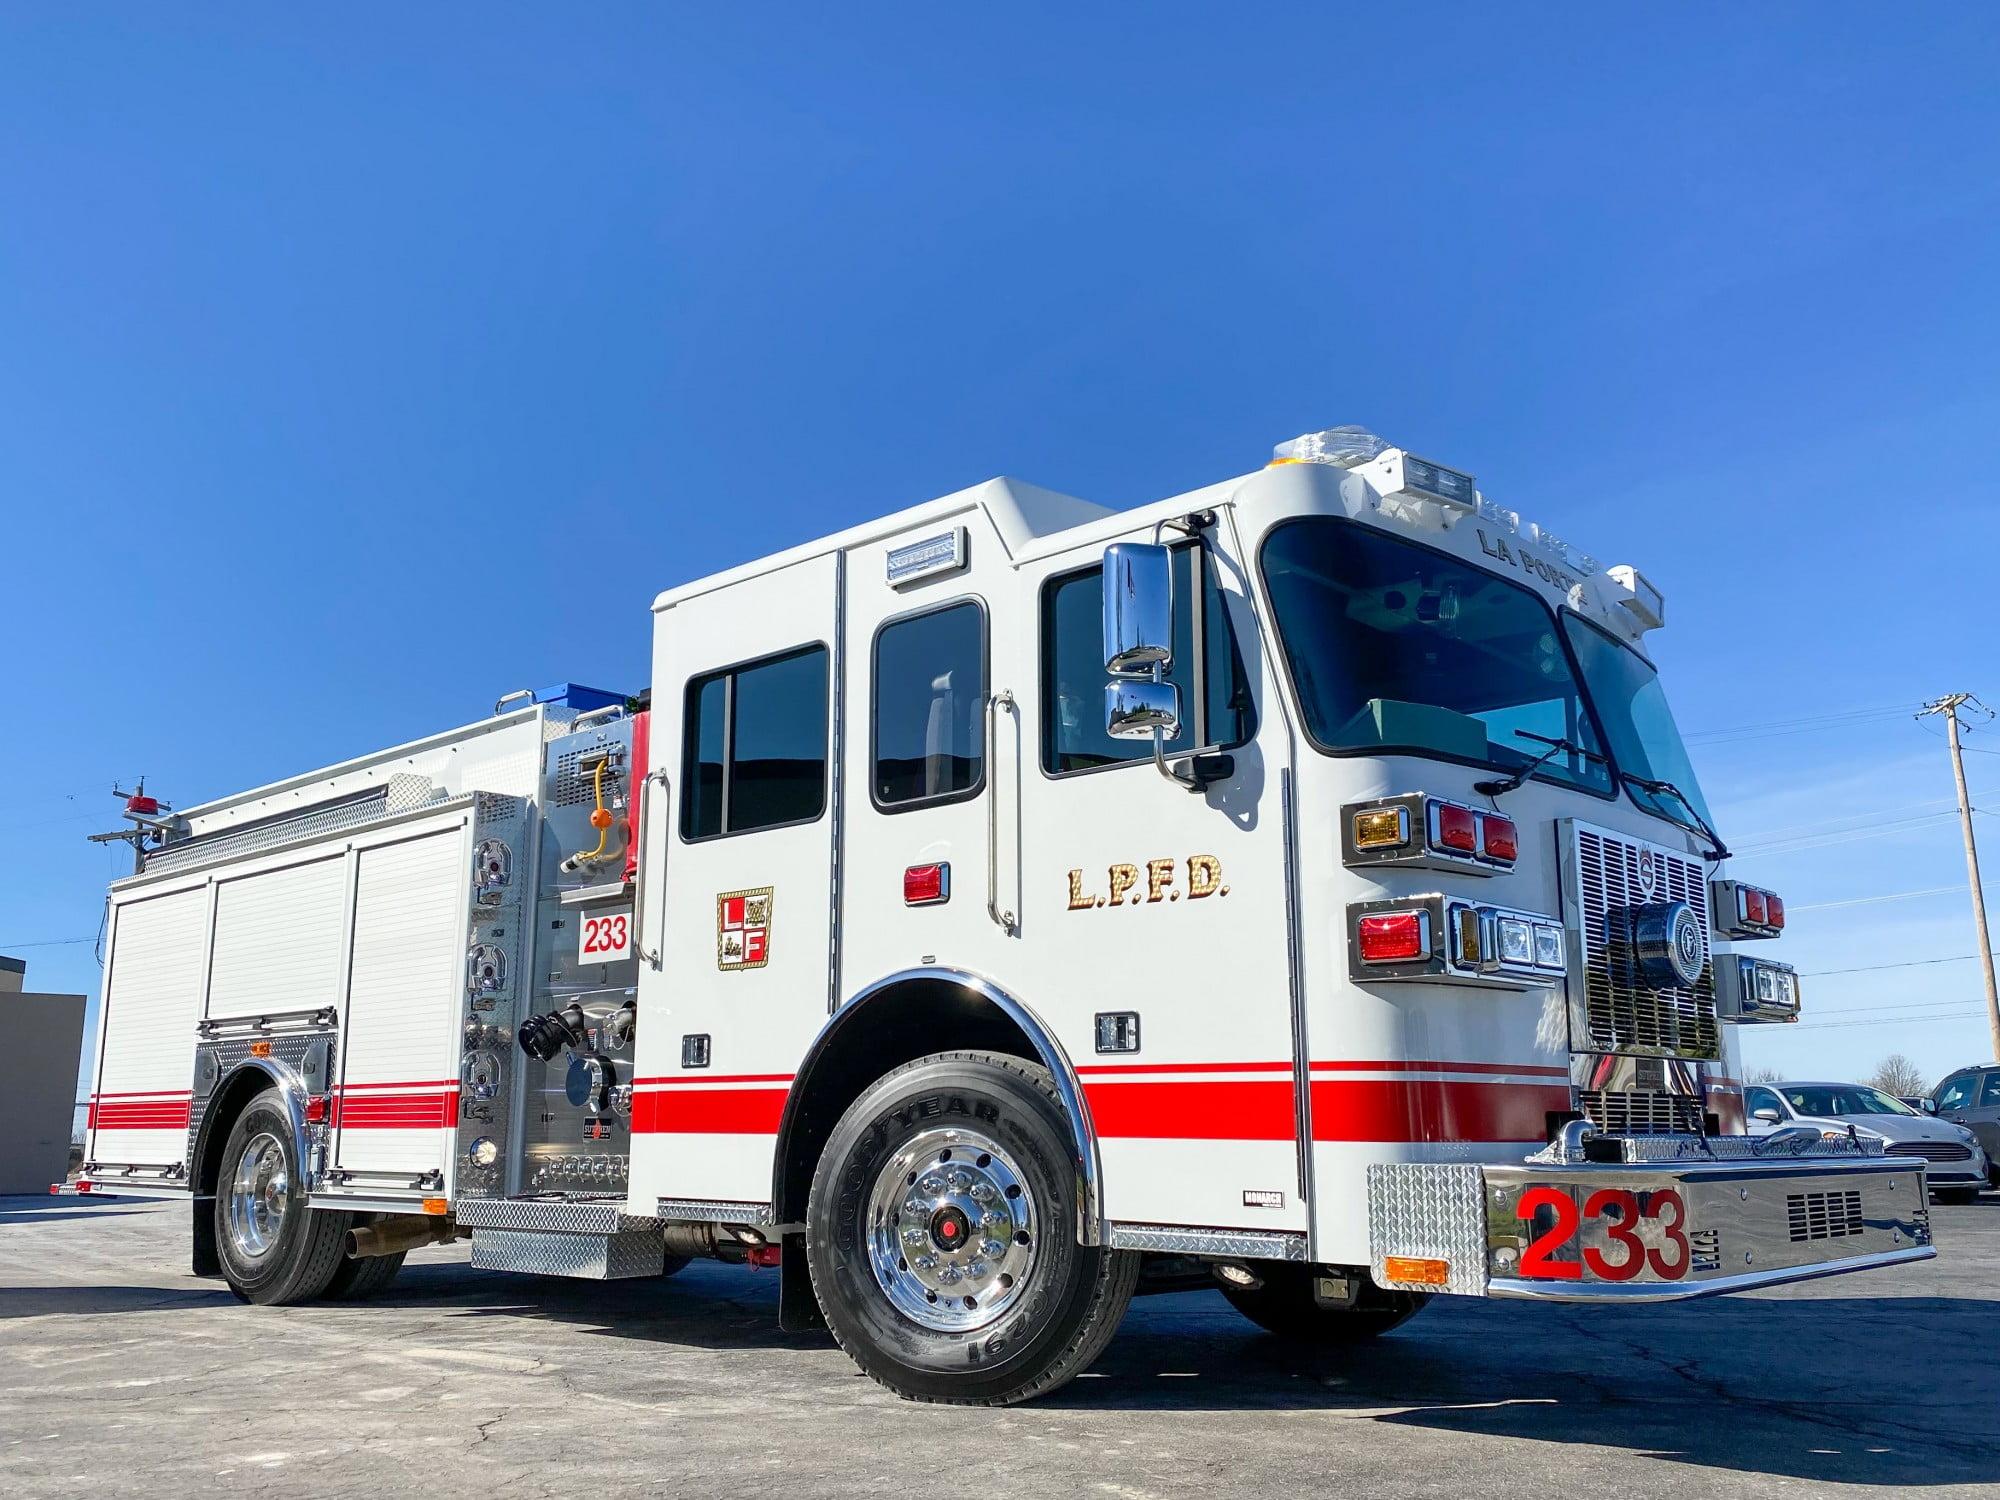 La Porte Fire Department, Texas